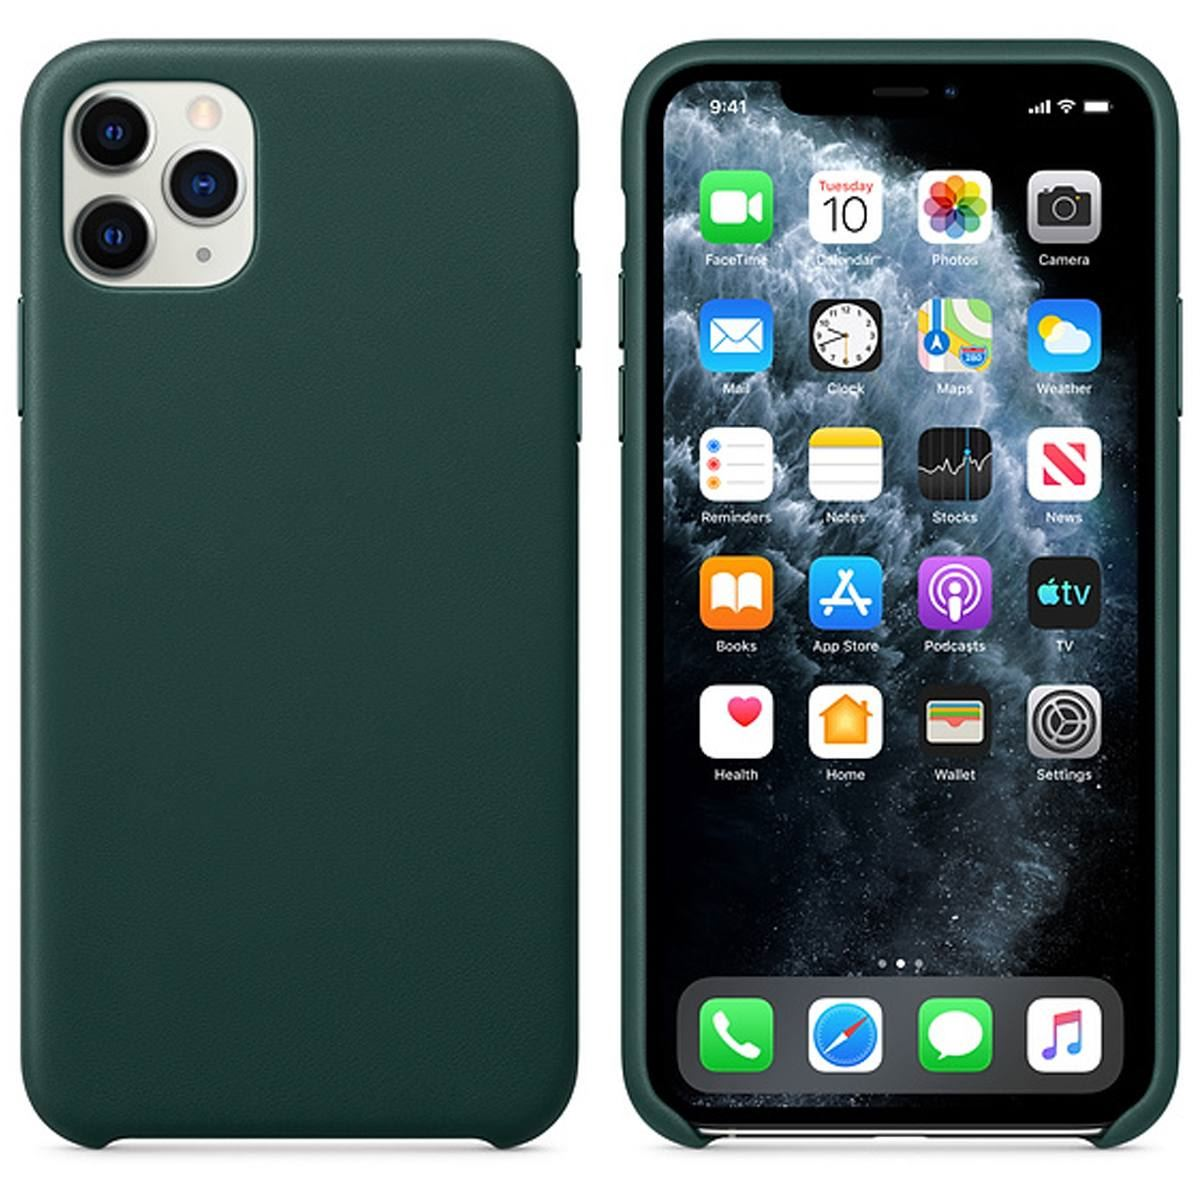 Leather-Slim-Case-Apple-iPhone-10-8-7-Plus-6s-5-Original-PU-Soft-Silicone-Cover thumbnail 16